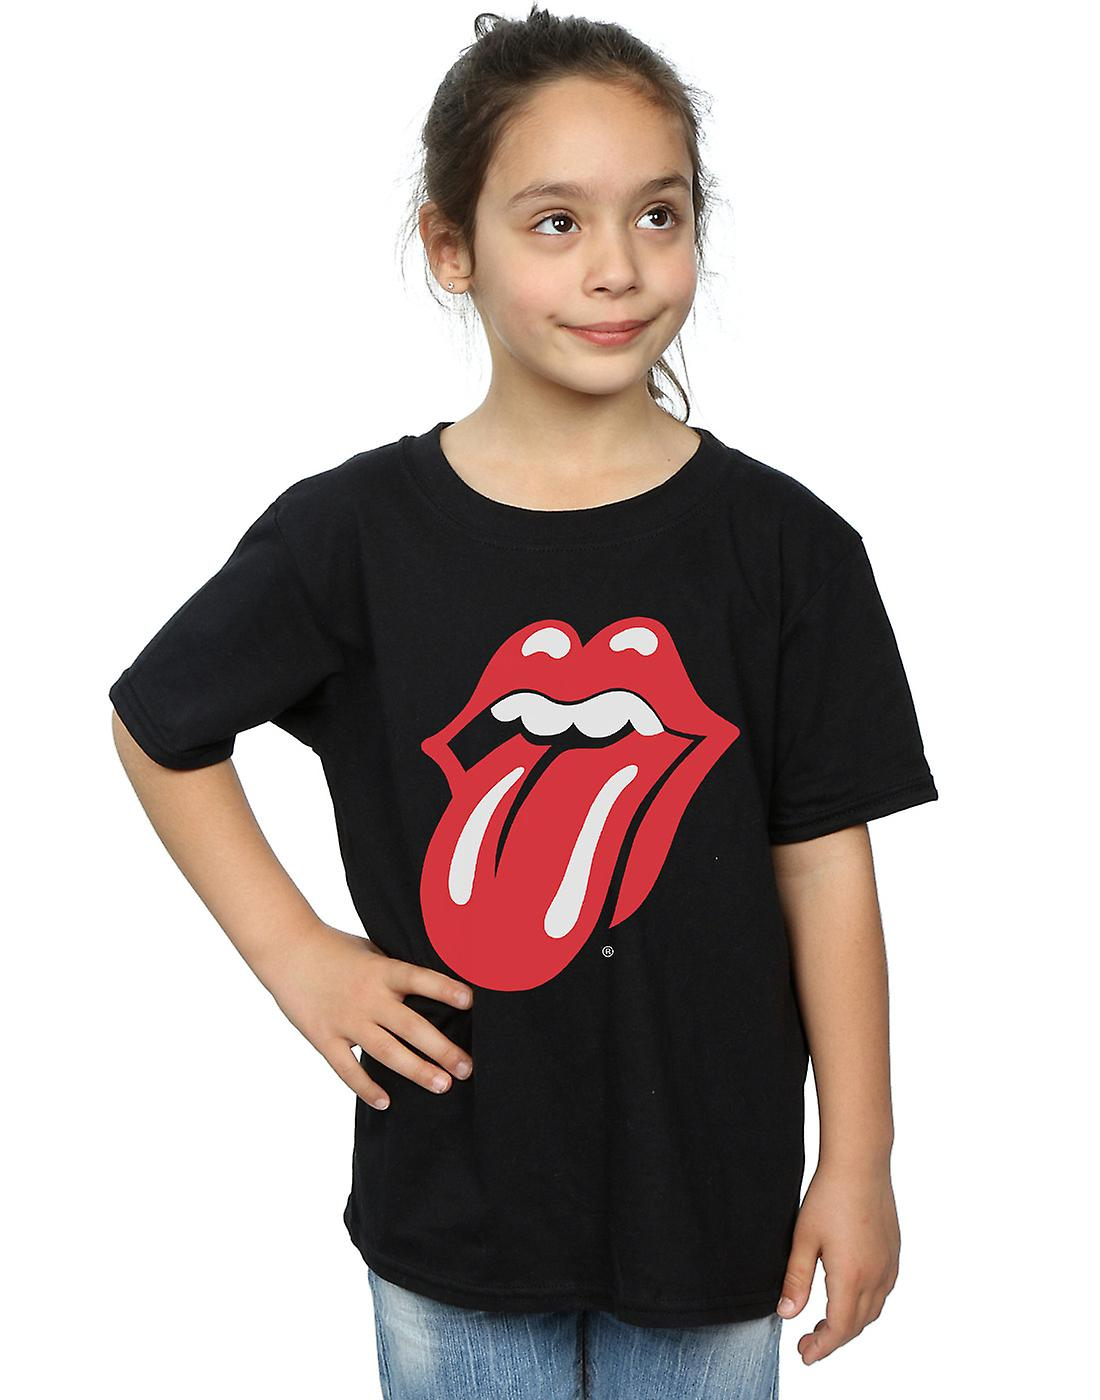 Rolling Stones Girls Classic Tongue T-Shirt